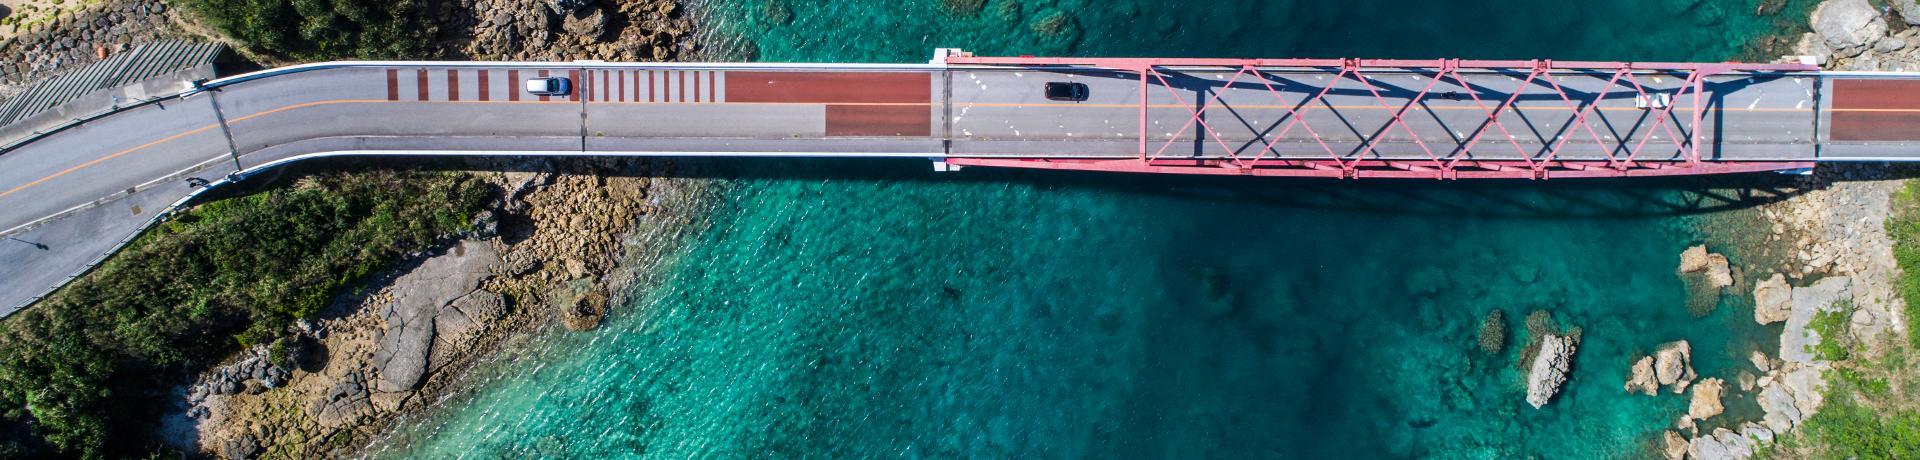 Küstenstraßen: Brücke - Meer